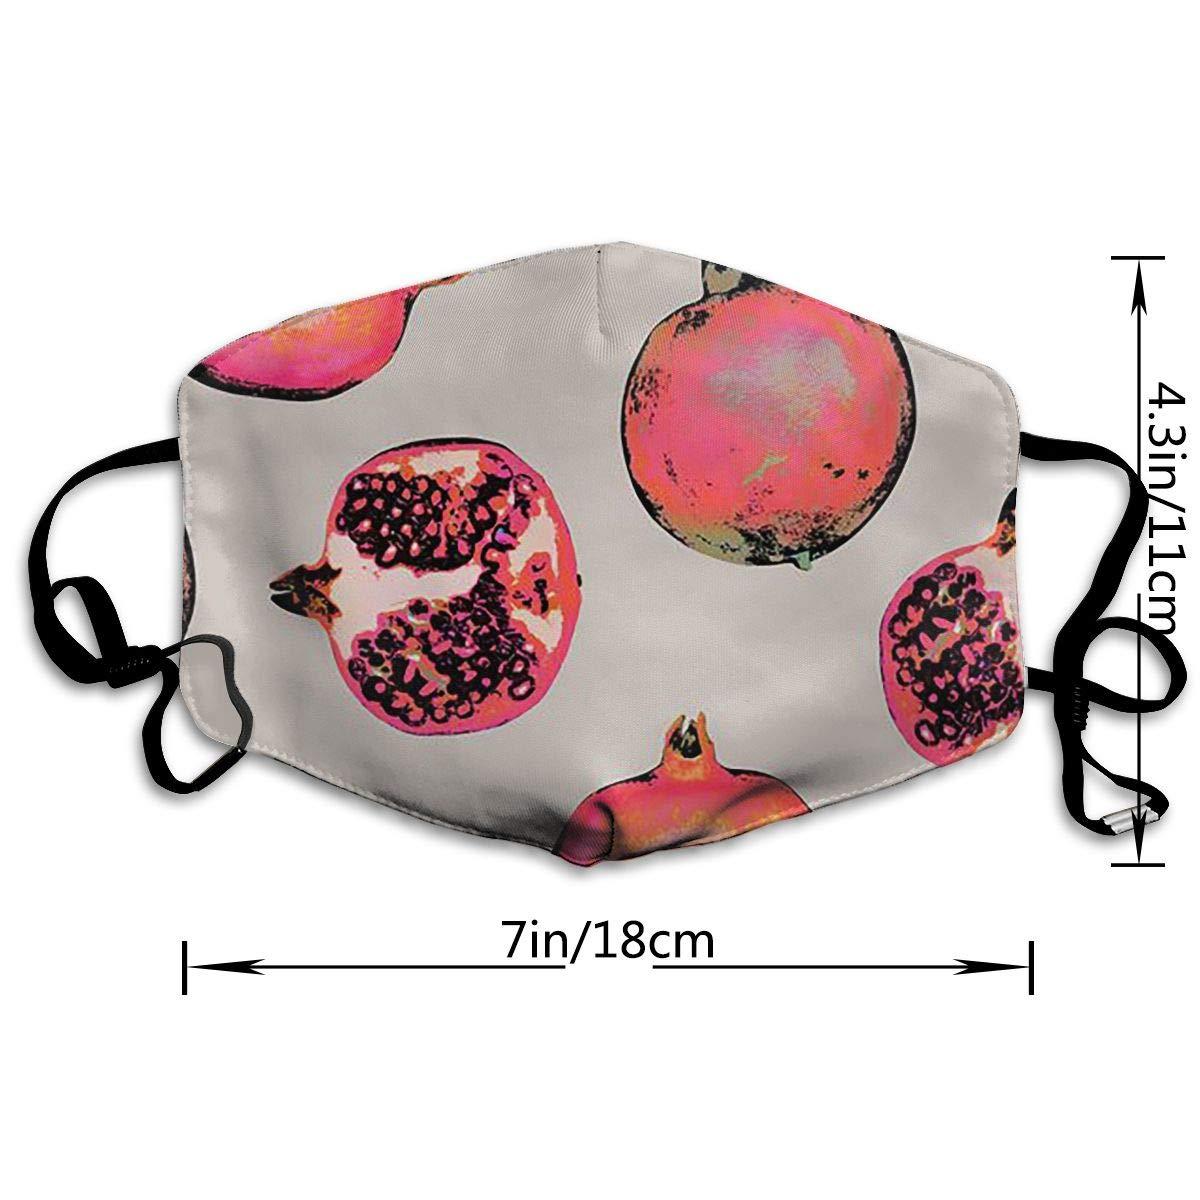 watercolor purse diagram online wiring diagram Watercolor Flowers amazon com niwaww pomegranate watercolor christmas stocking xmas watercolor purse diagram